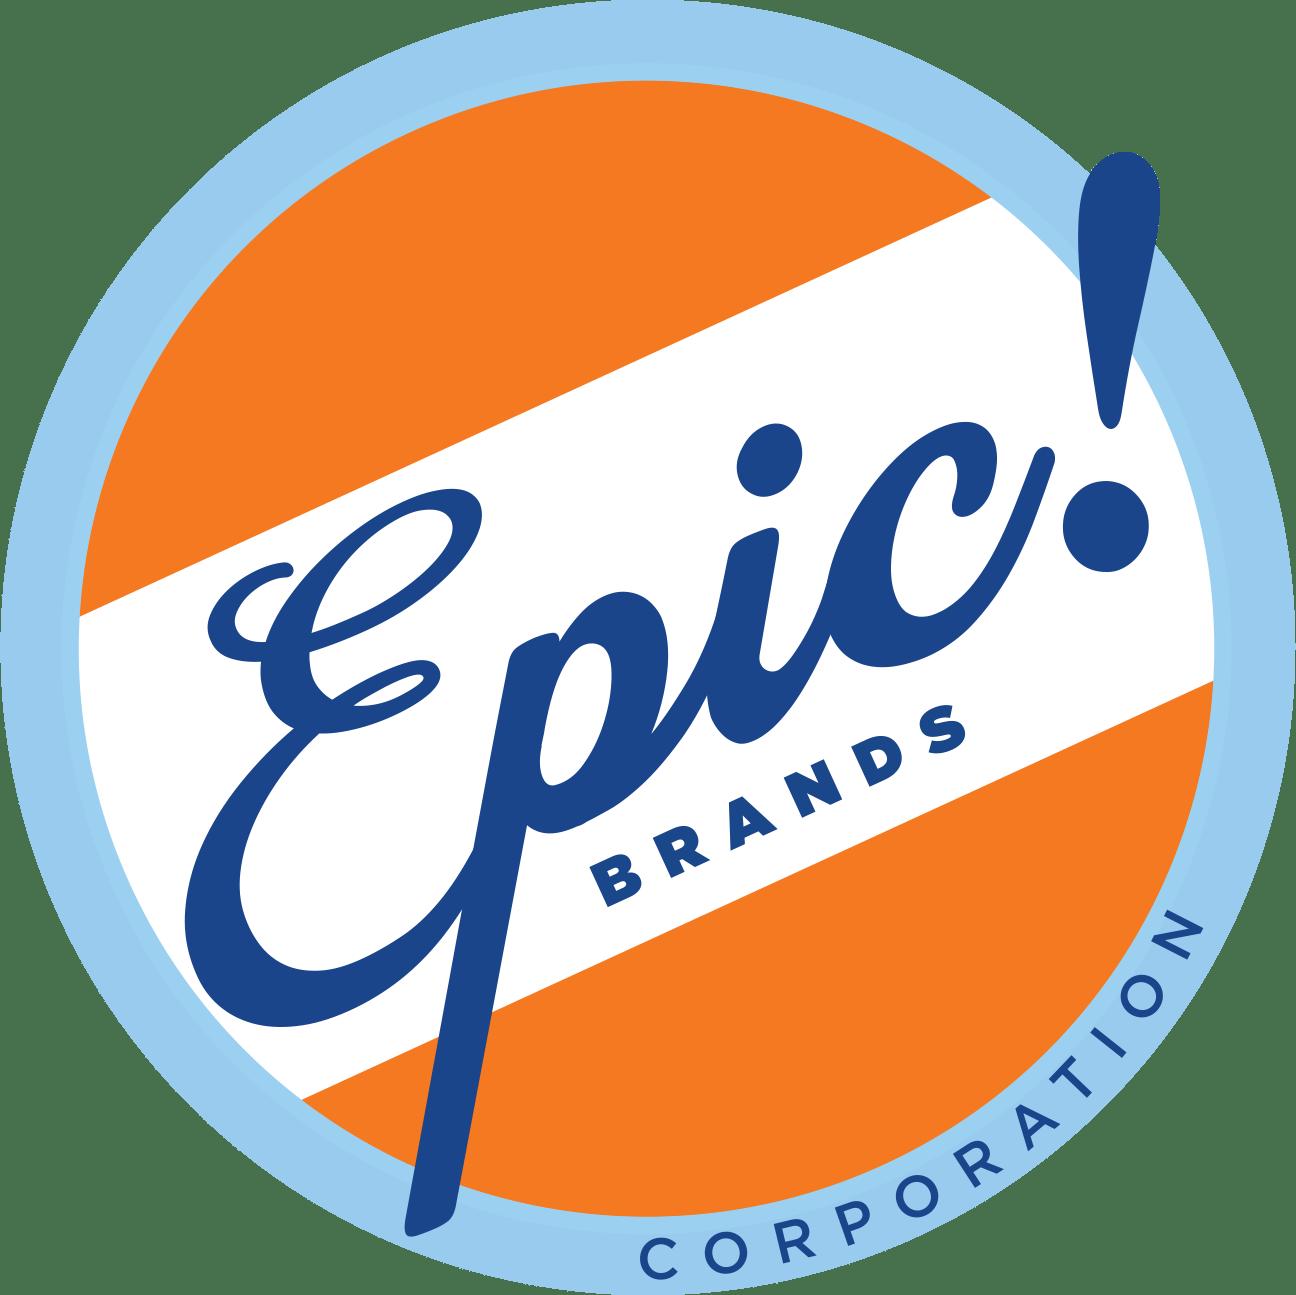 Epic Brand Corporation